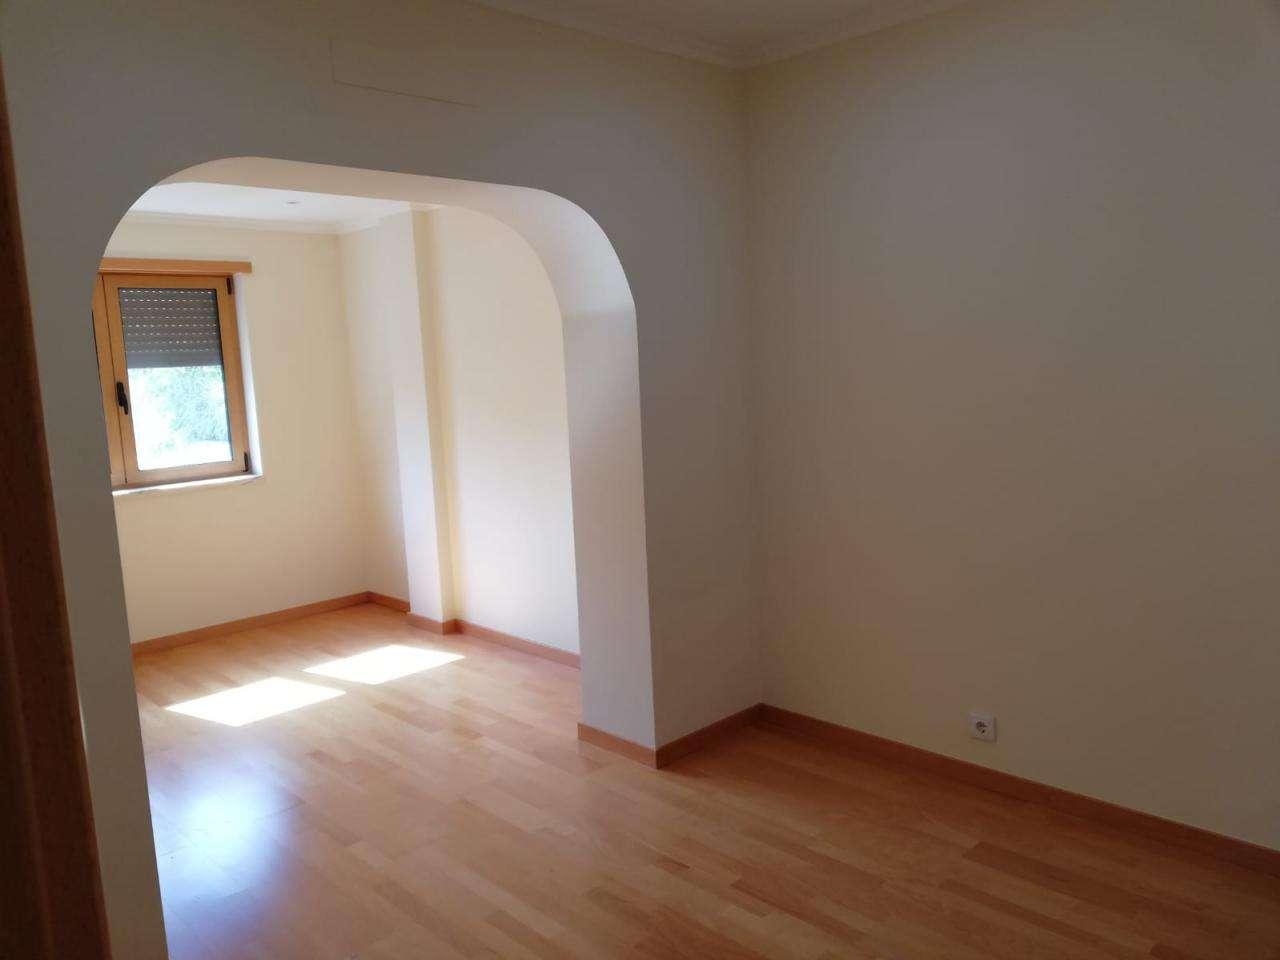 Moradia para arrendar, Beato, Lisboa - Foto 1